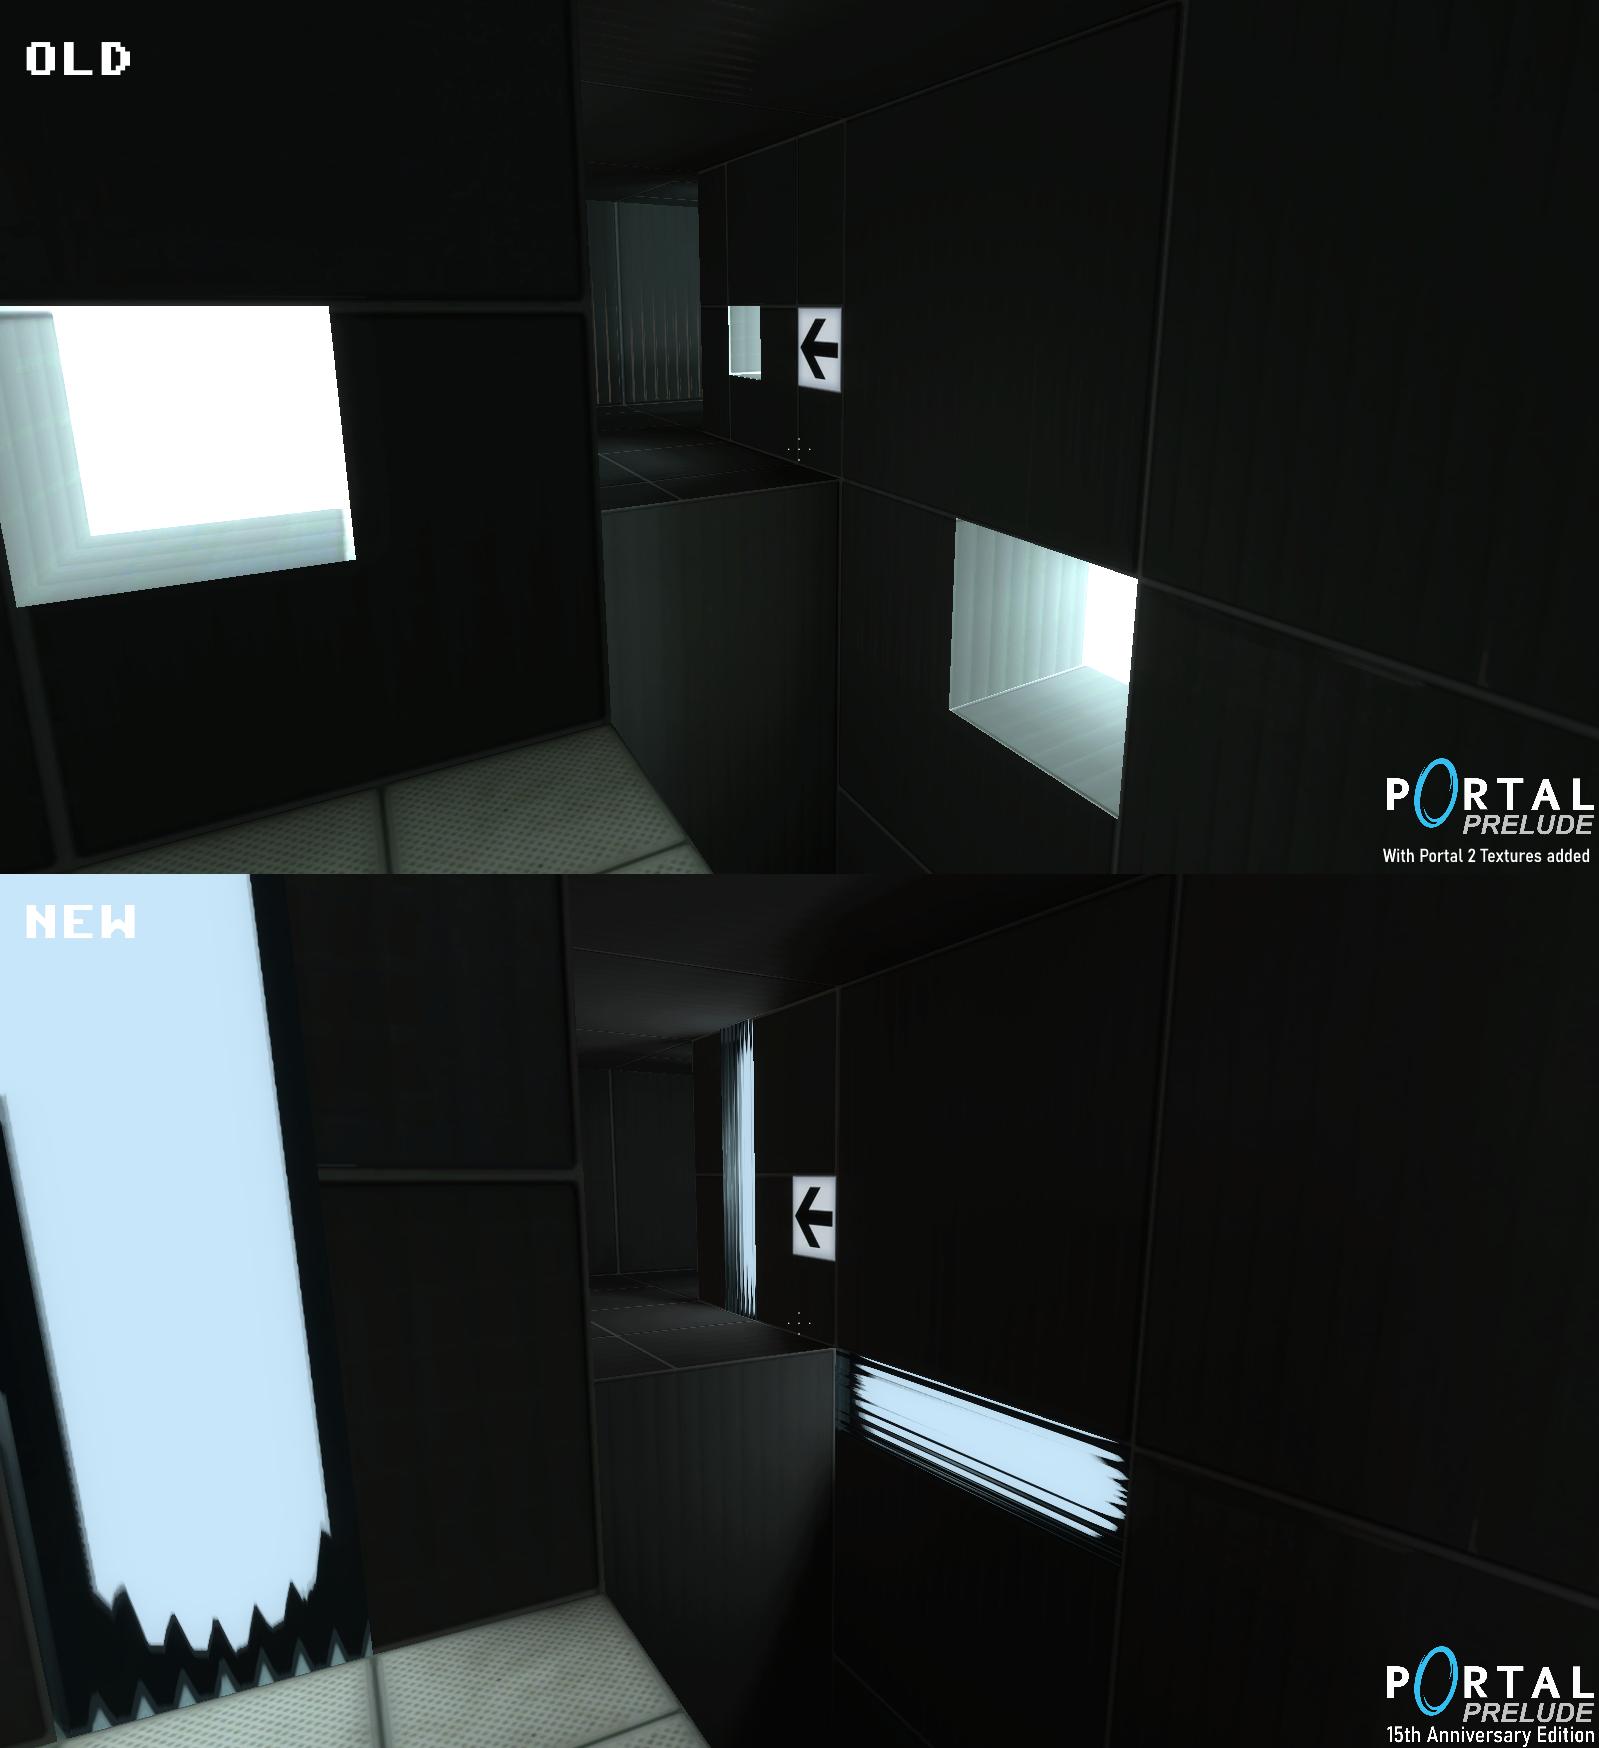 lightingcomparison